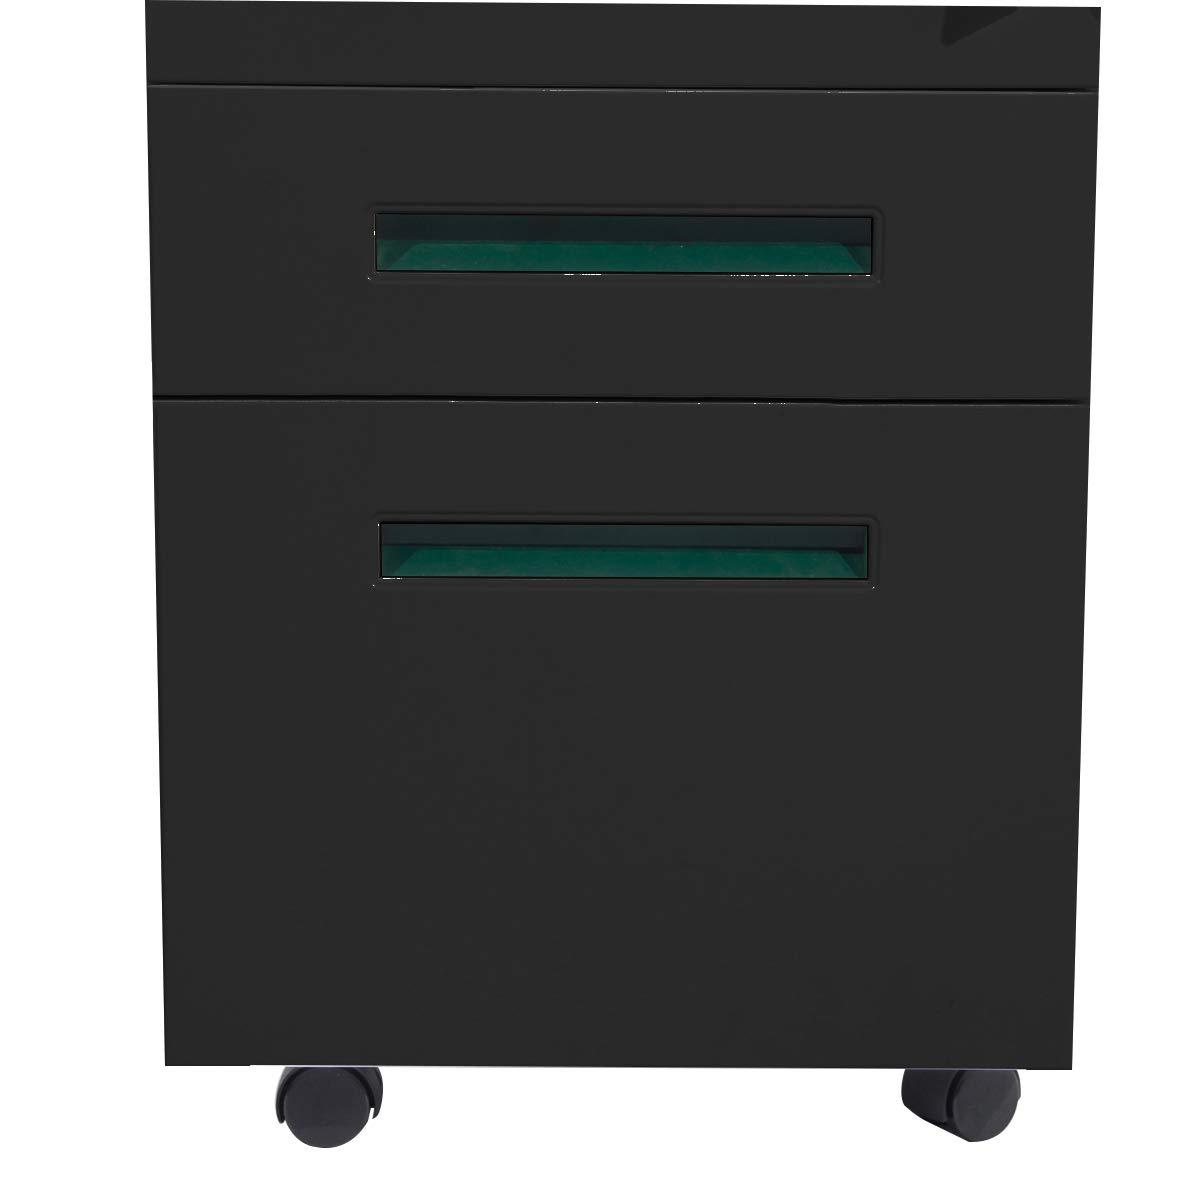 SogesHome 3-Drawer Black File Cabinet Under Desk Office Drawers for Legal Letter File NSD-CA-HCCBN003-B